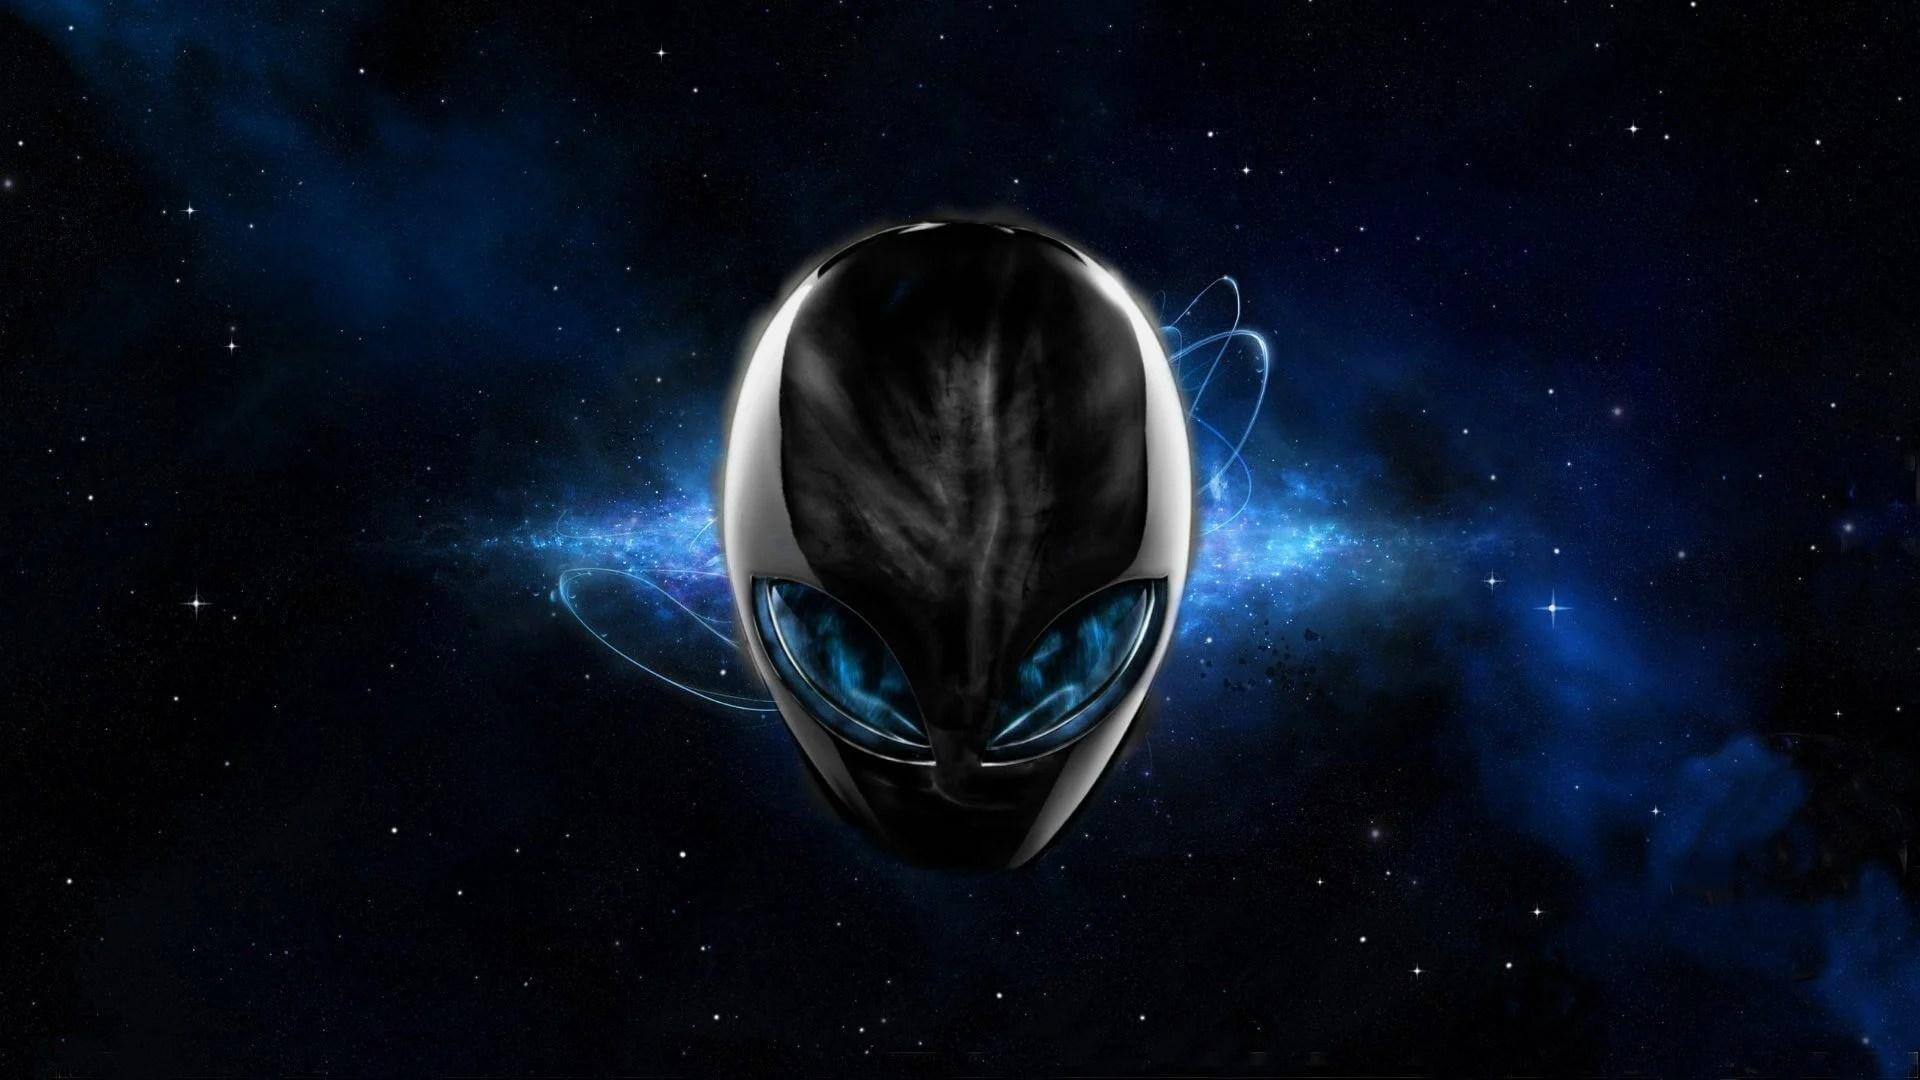 Alienware Desktop Background Blue Space Alienware Head 1920x1080 - Dell lança linha gamer de acessórios e monitores Alienware no Brasil